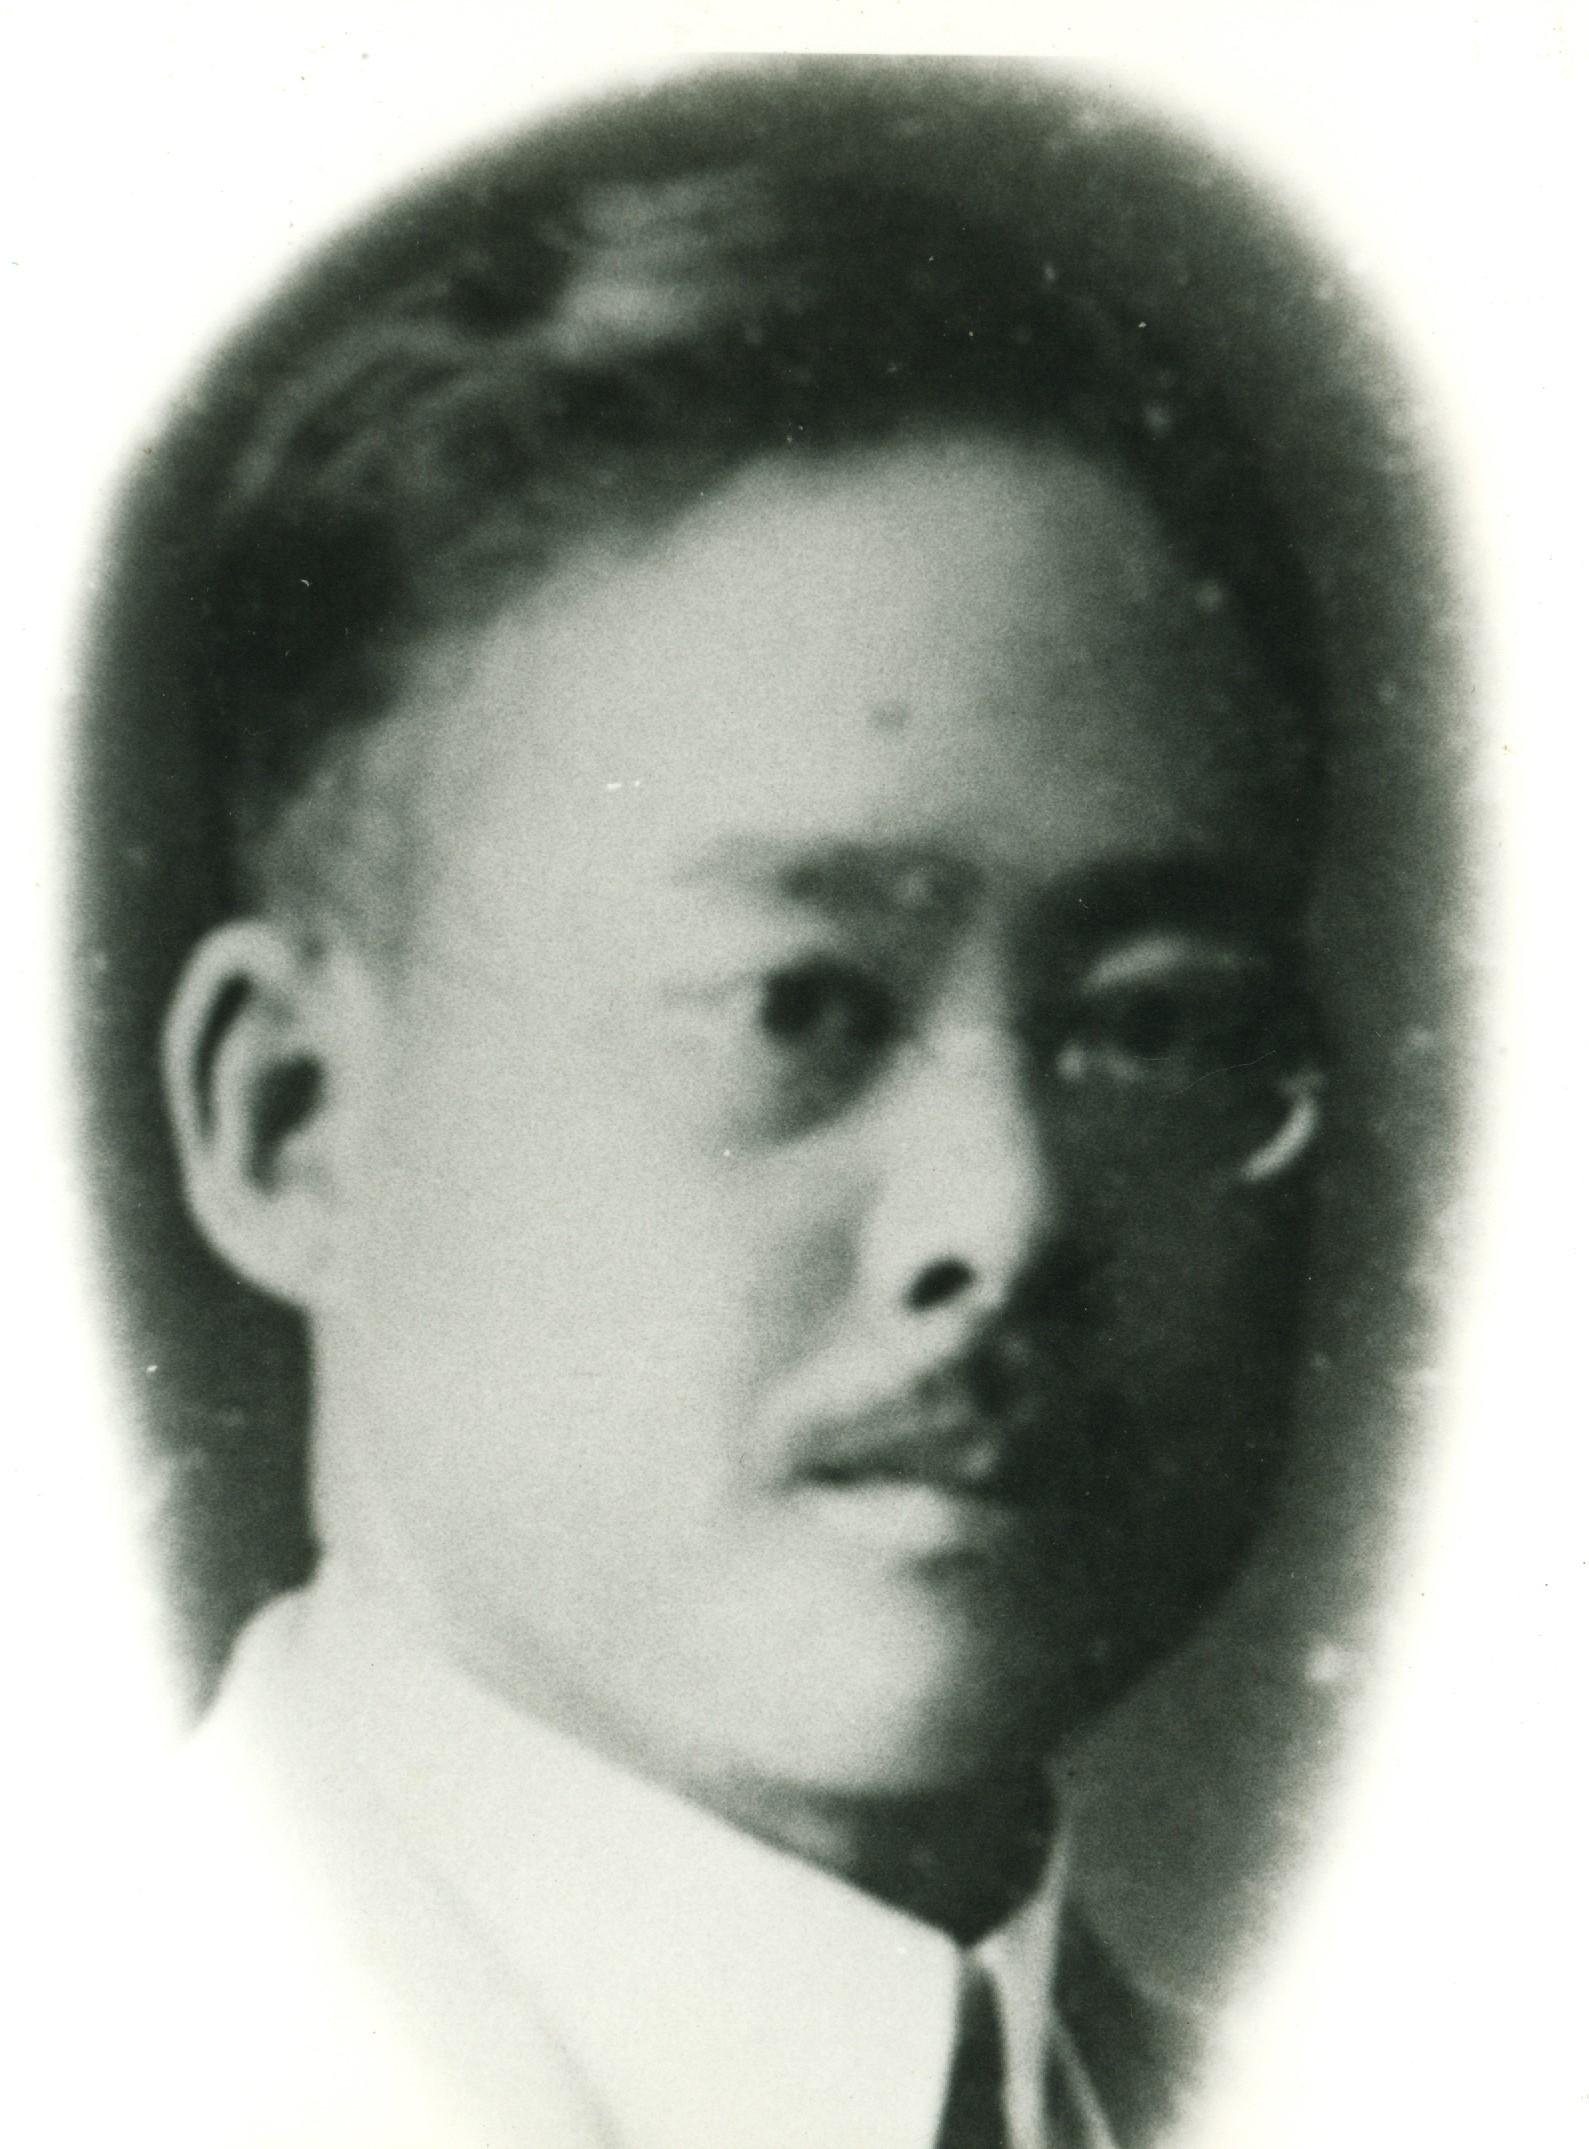 Kojiro Kokita 1915-1916